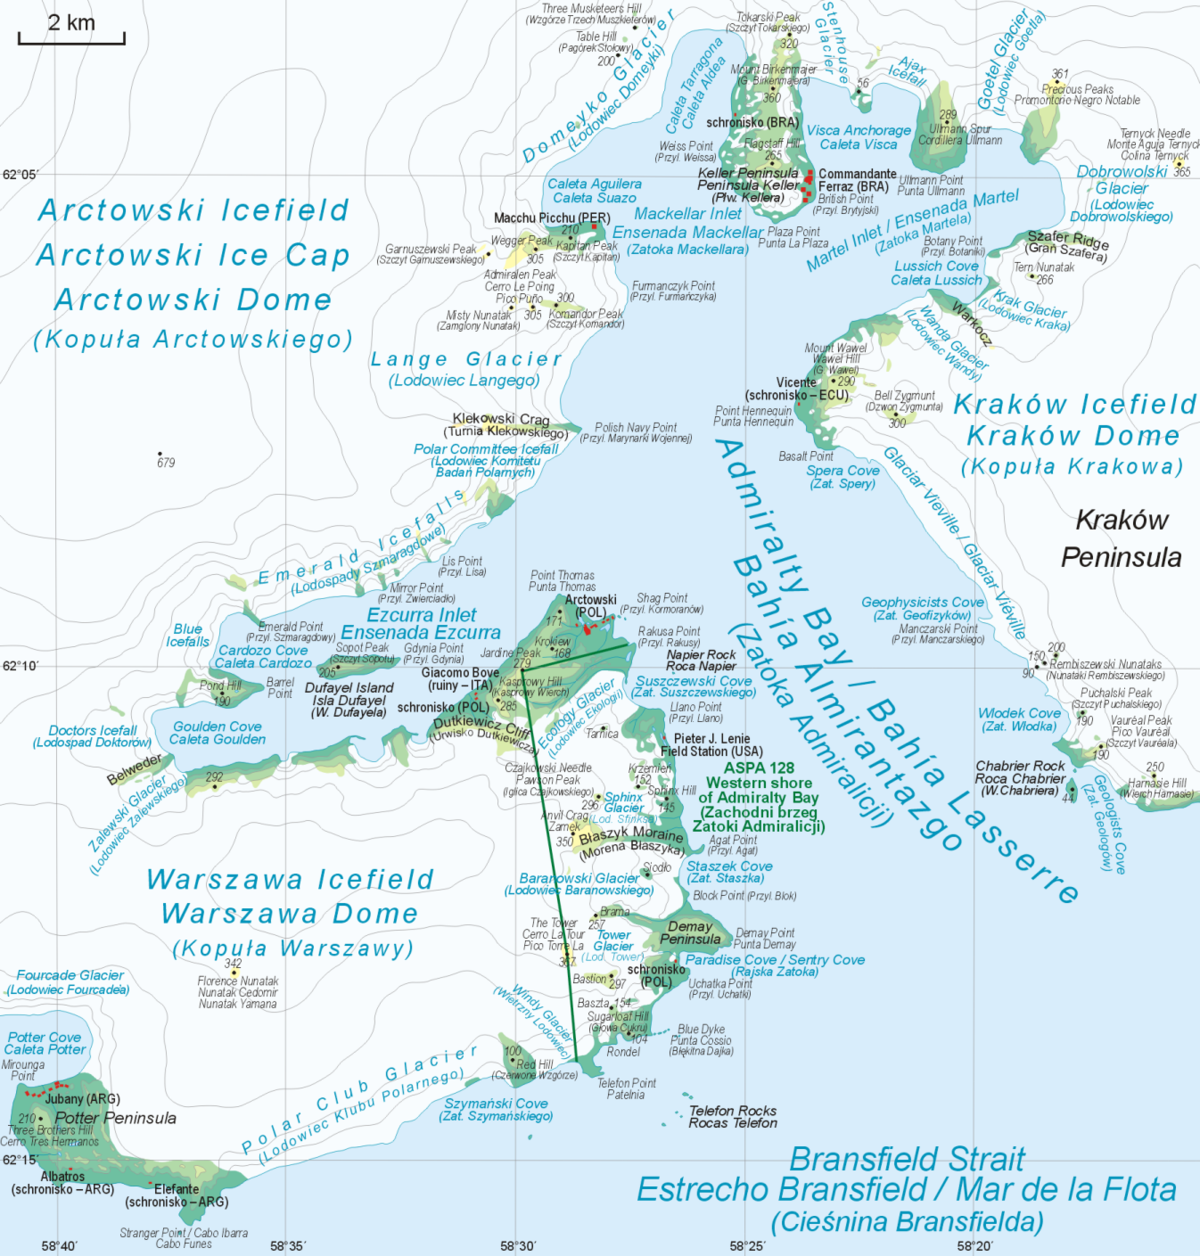 Admiralty Bay (South Shetland Islands)